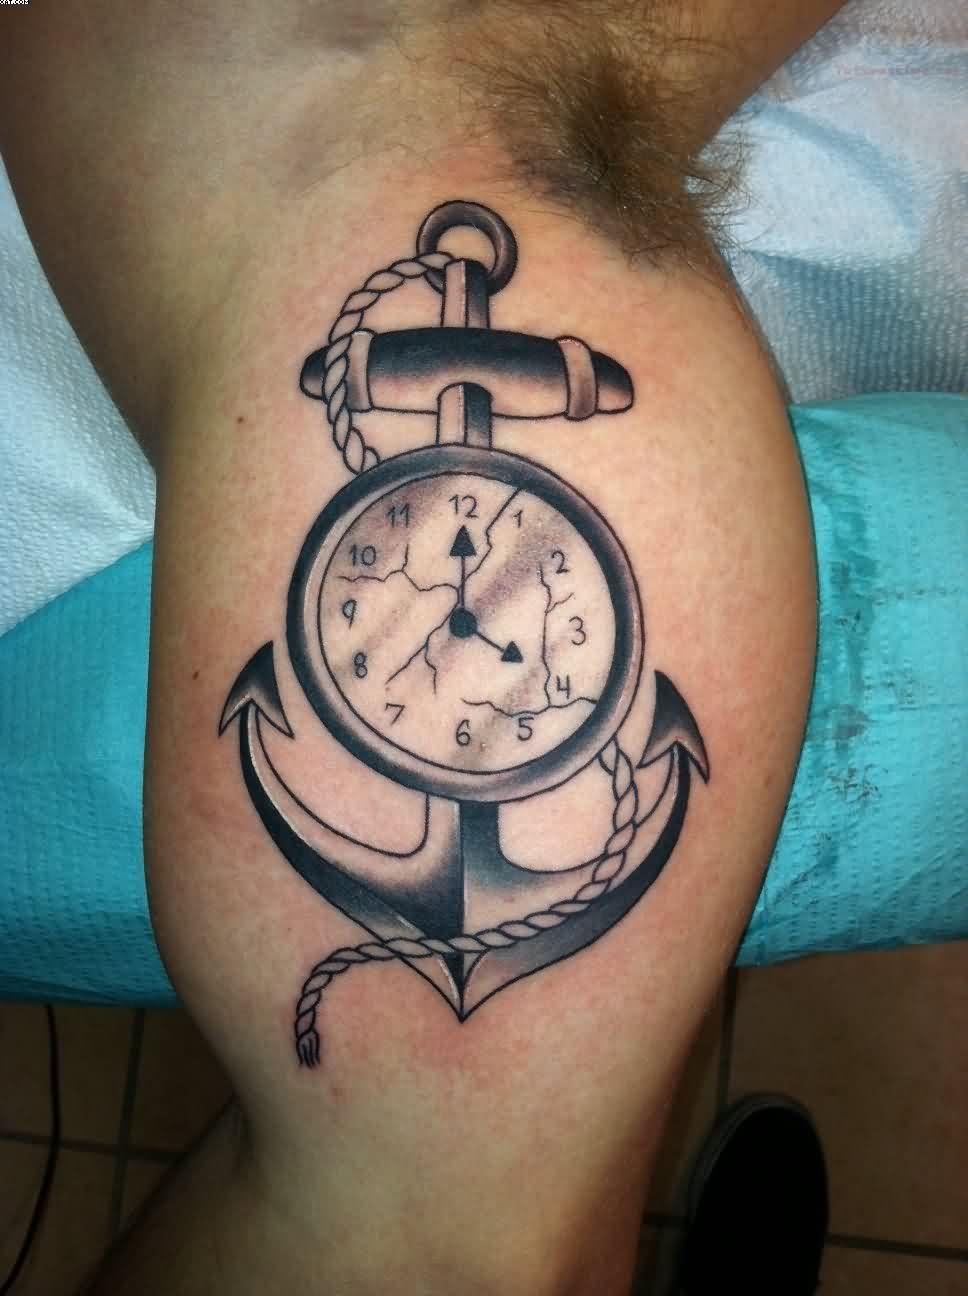 Motivational Black Color Ink Anchor Clock Tattoo On Boy Arm